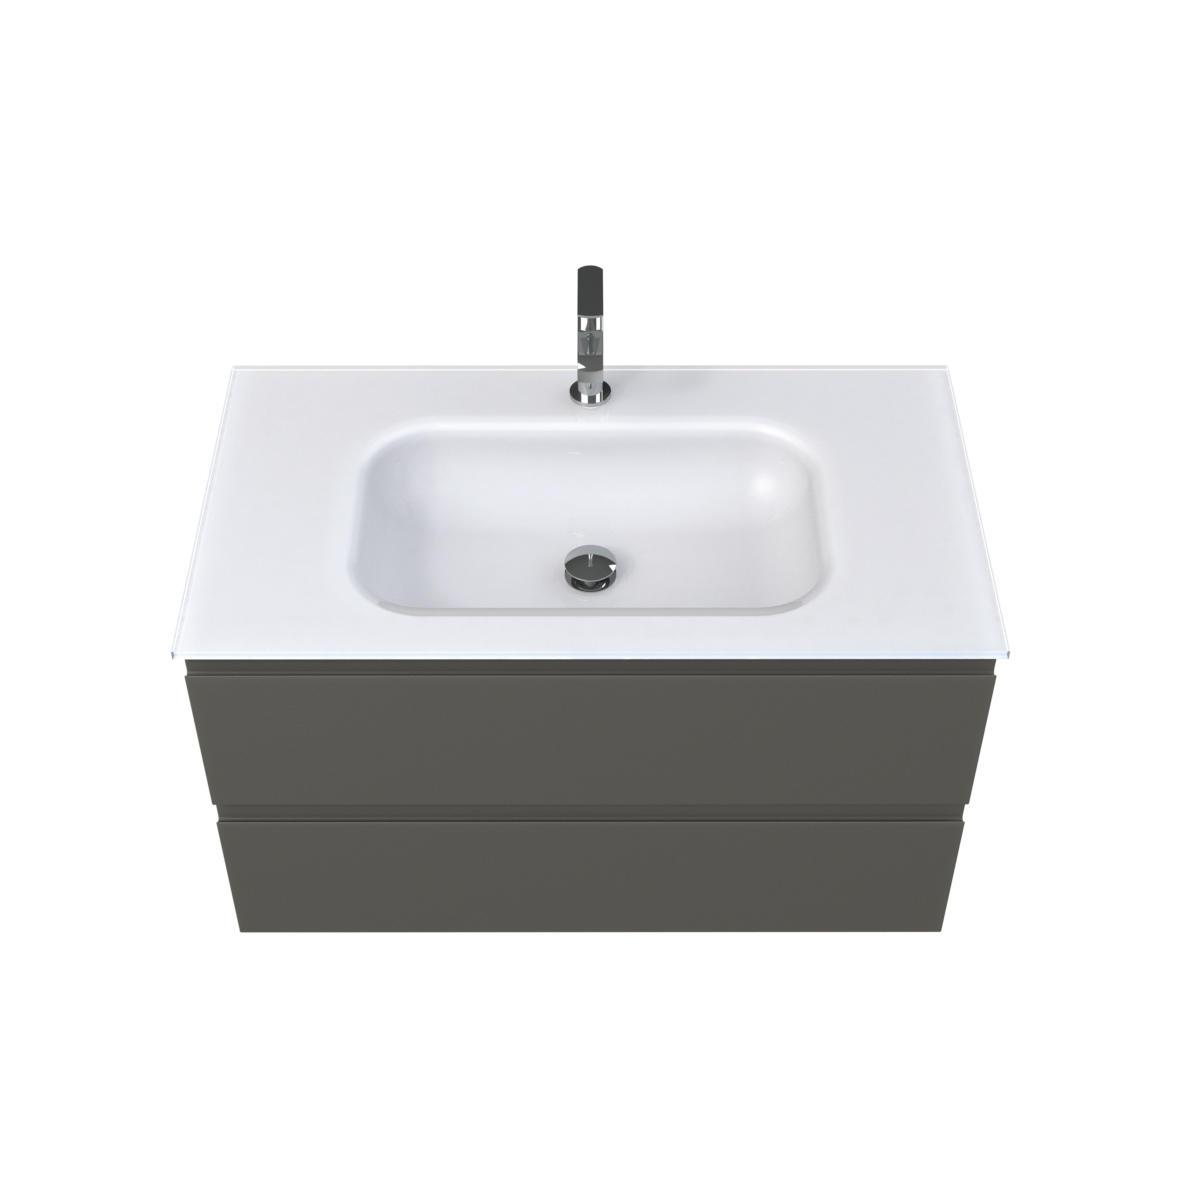 Plan vasque verre blanc mat